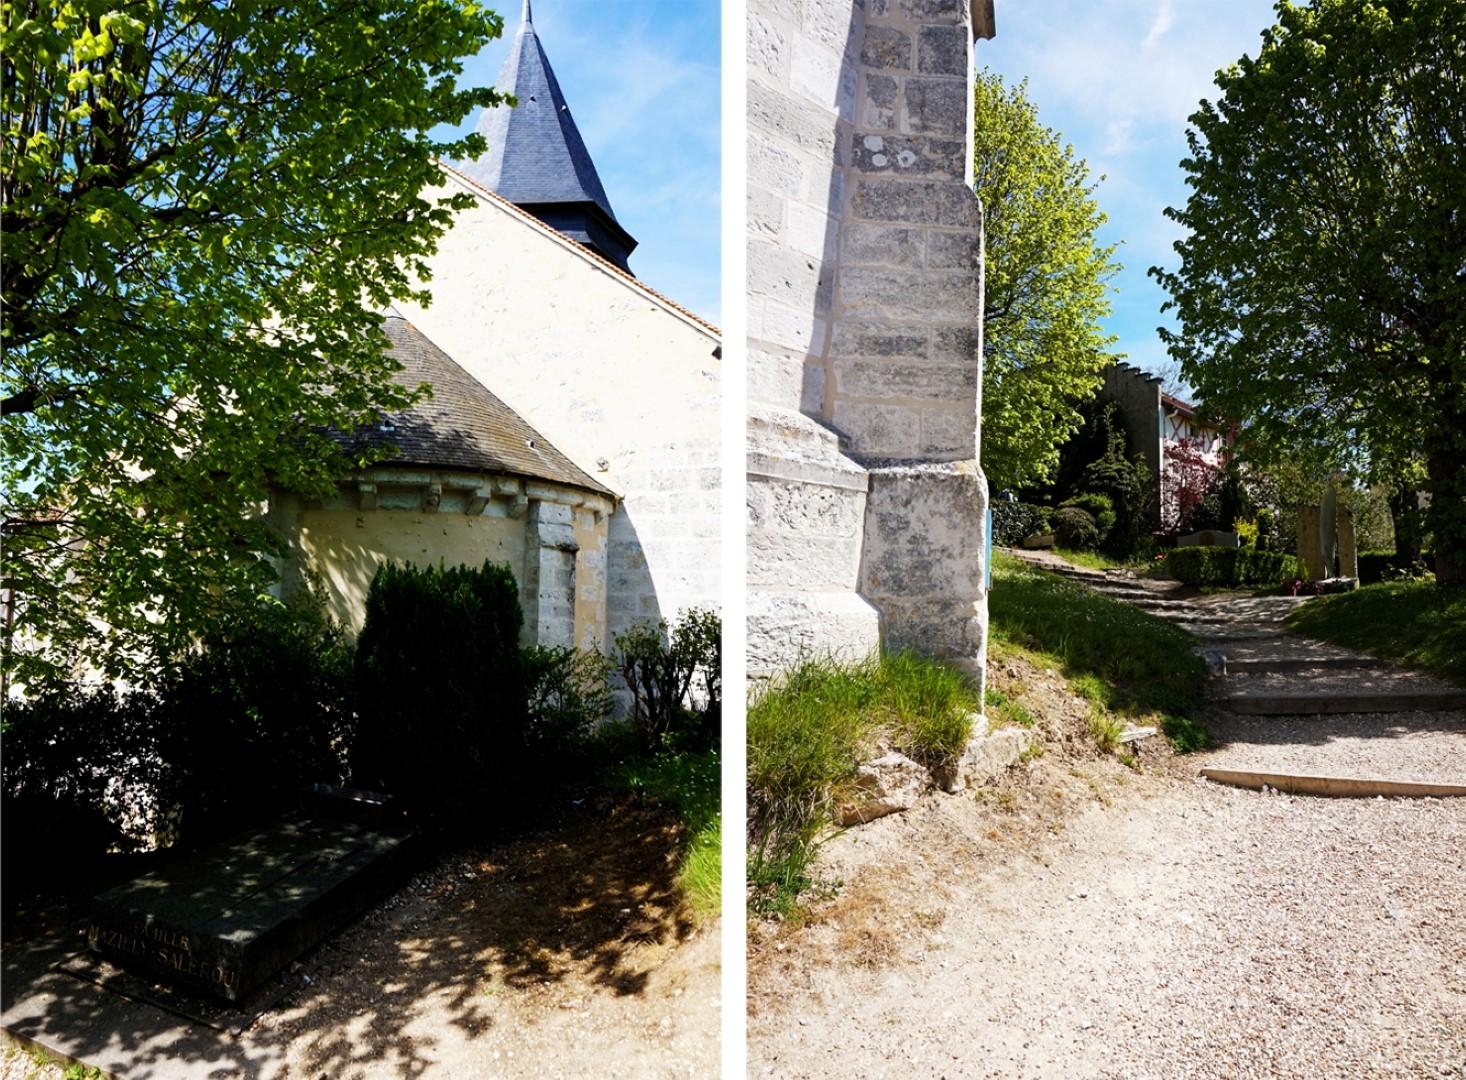 Balade dans Giverny - Eglise Sainte Radegonde